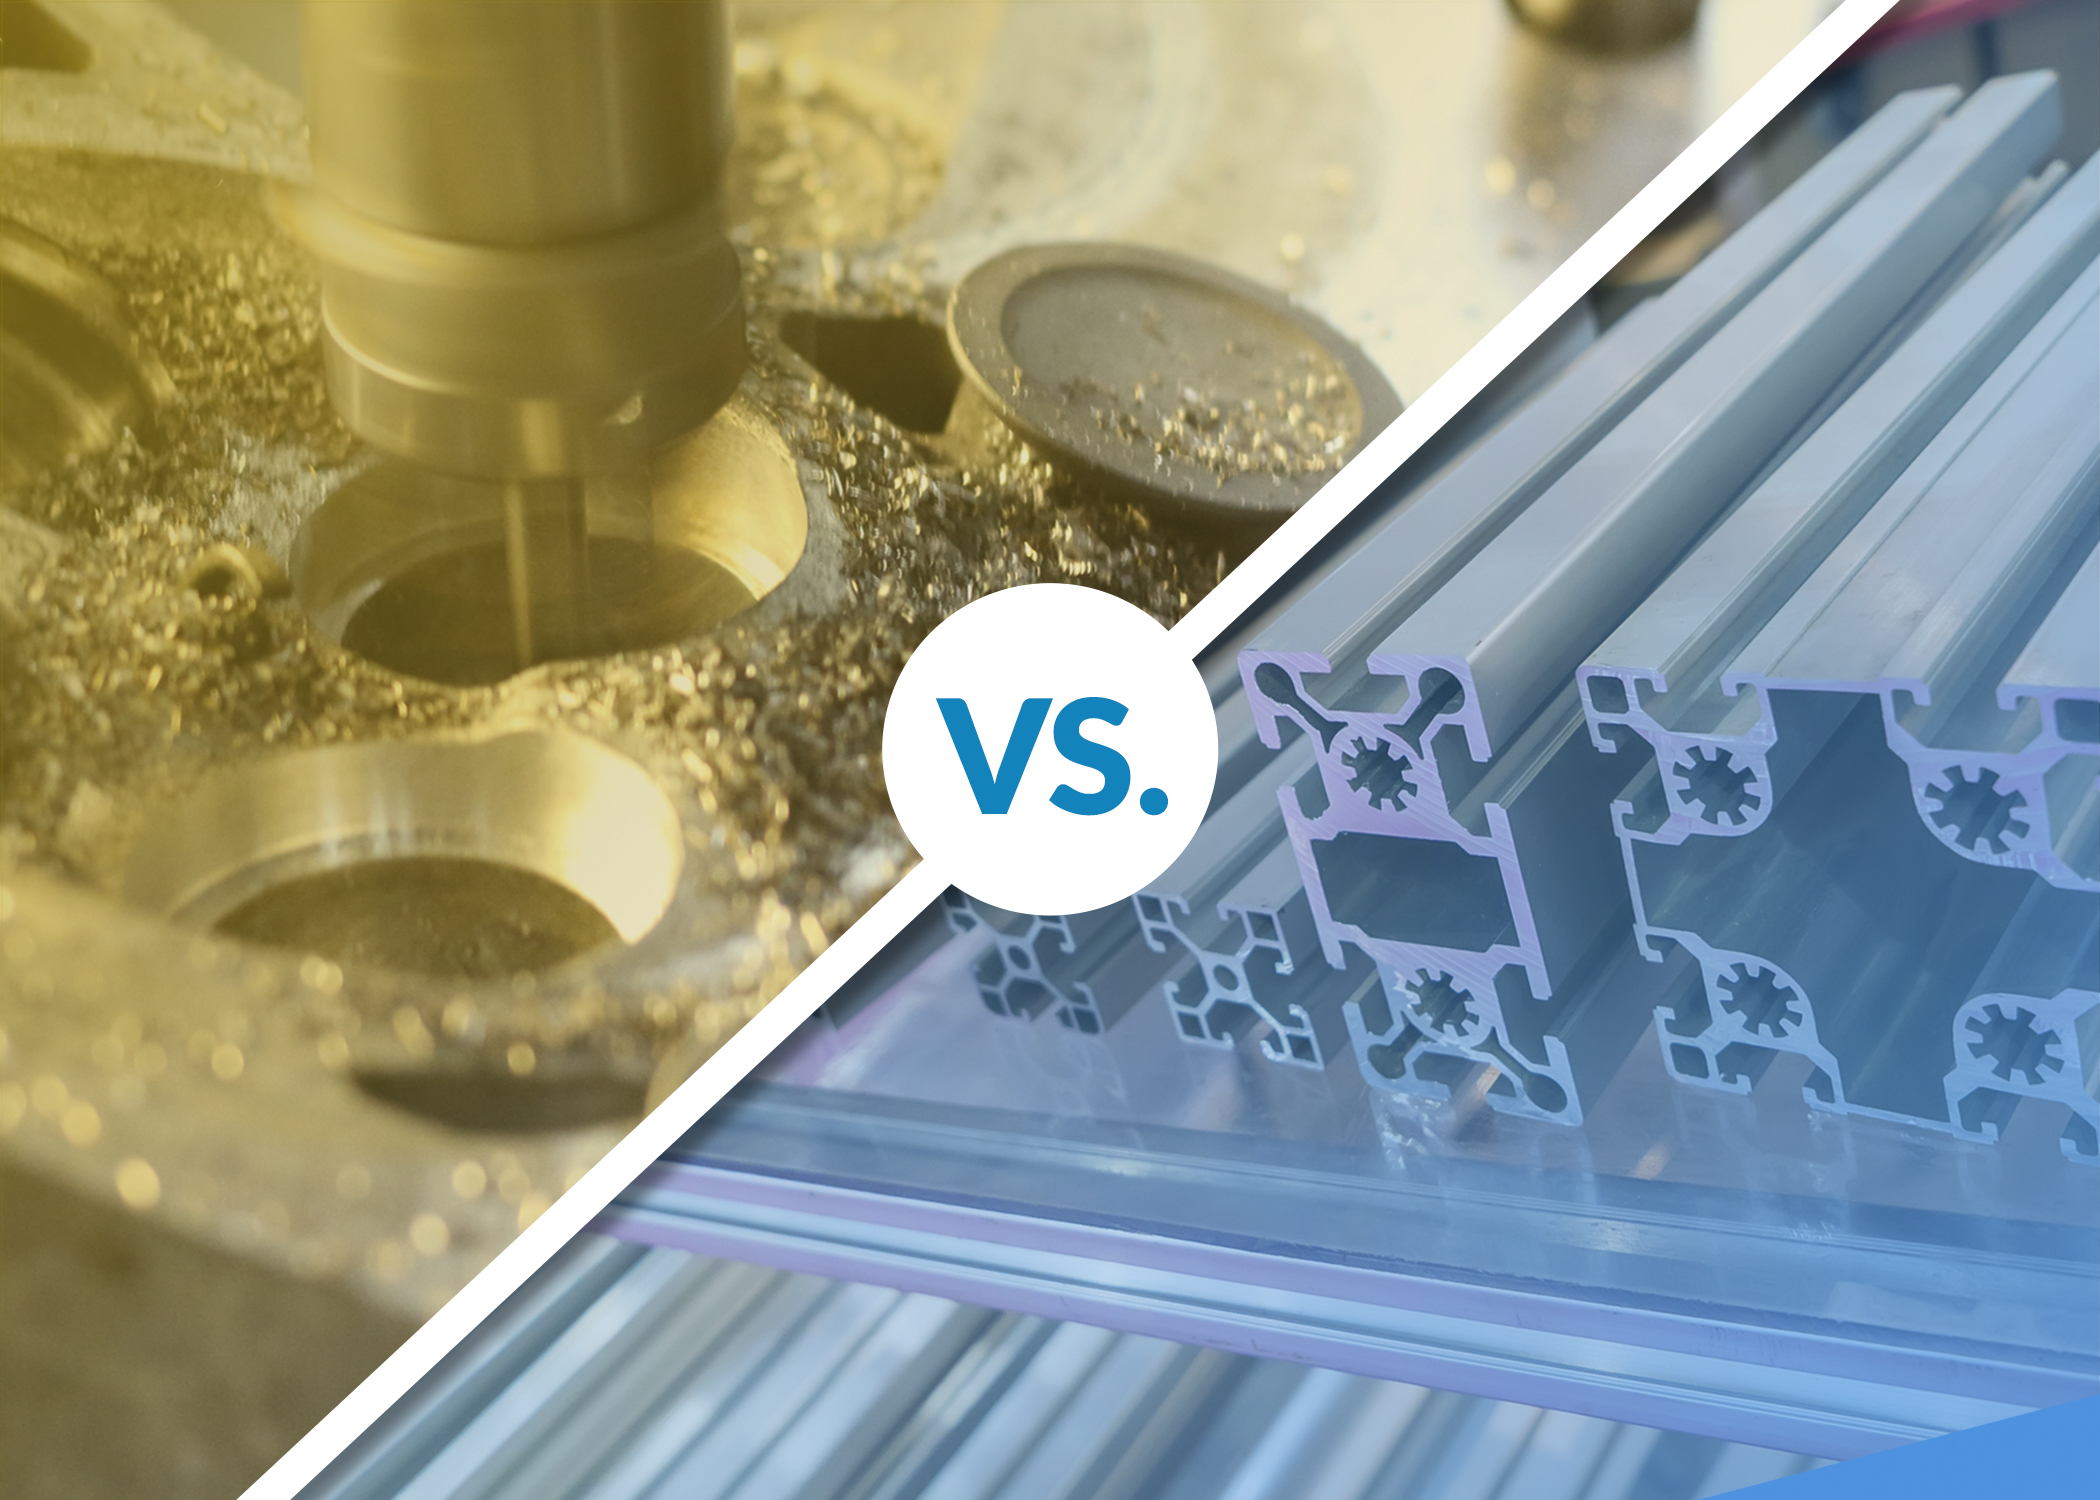 Machine vs Extruding Image